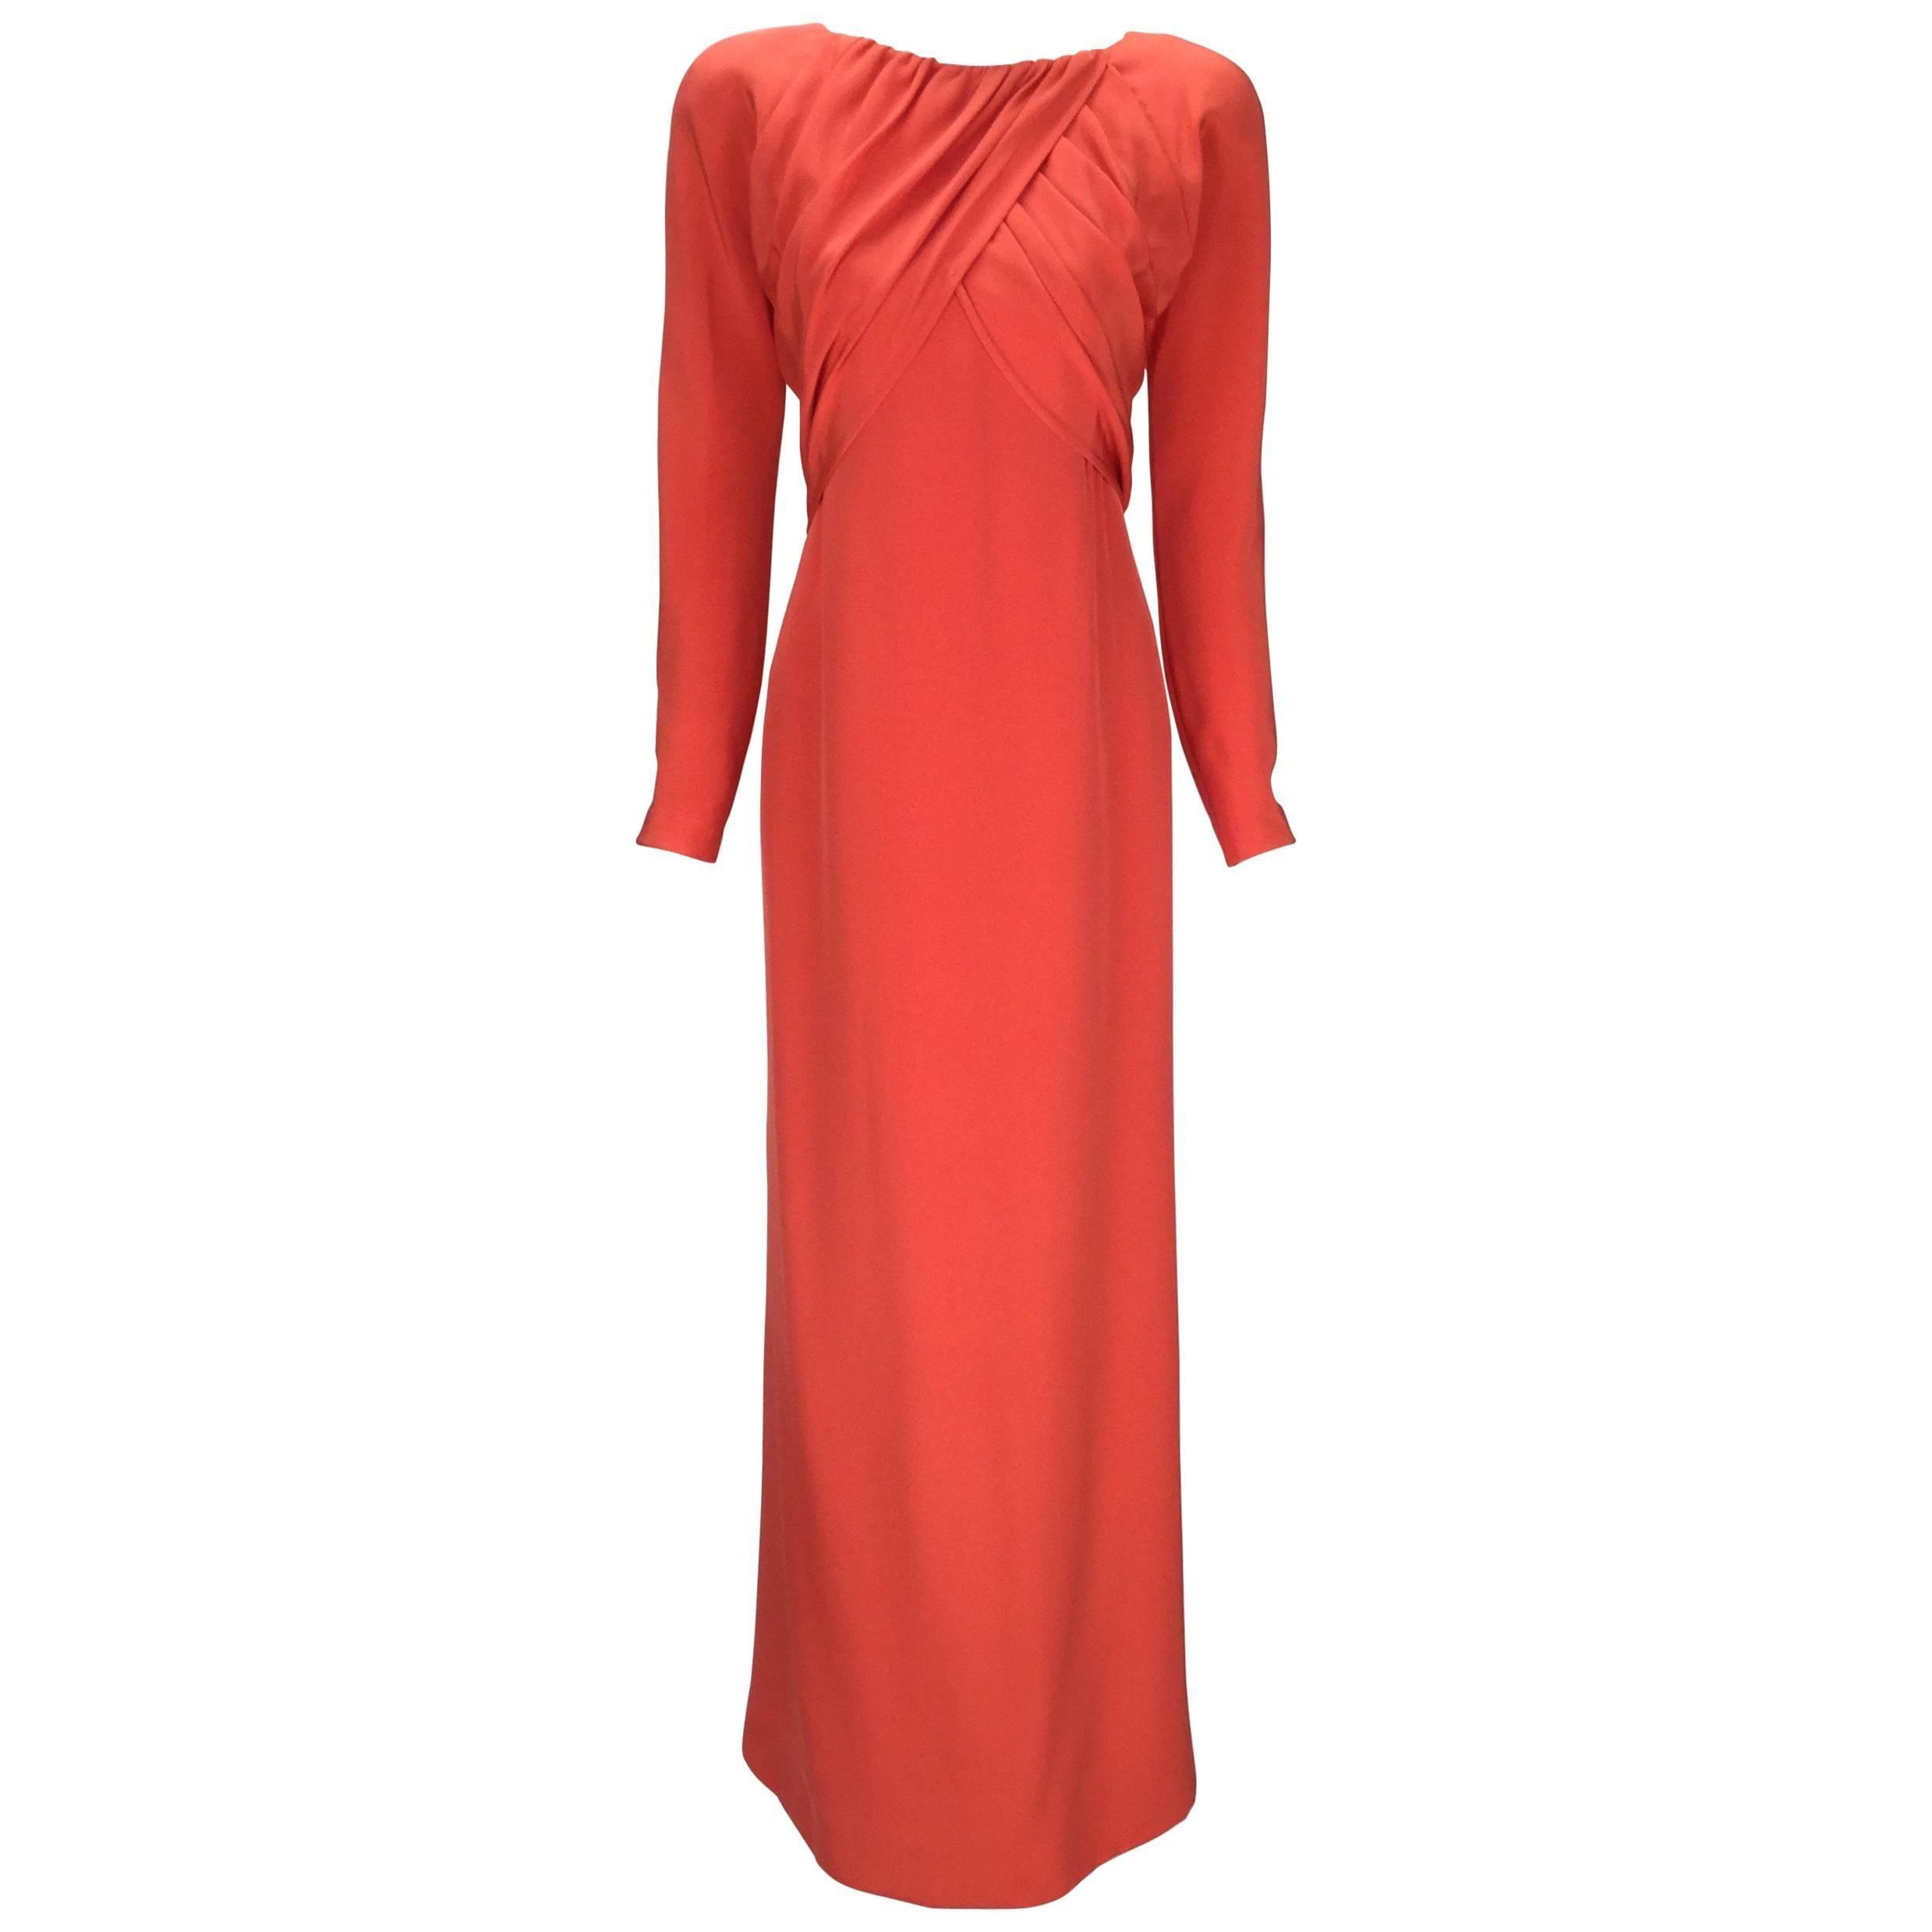 Halston Red Silk Long Sleeve Evening Dress, 1970s